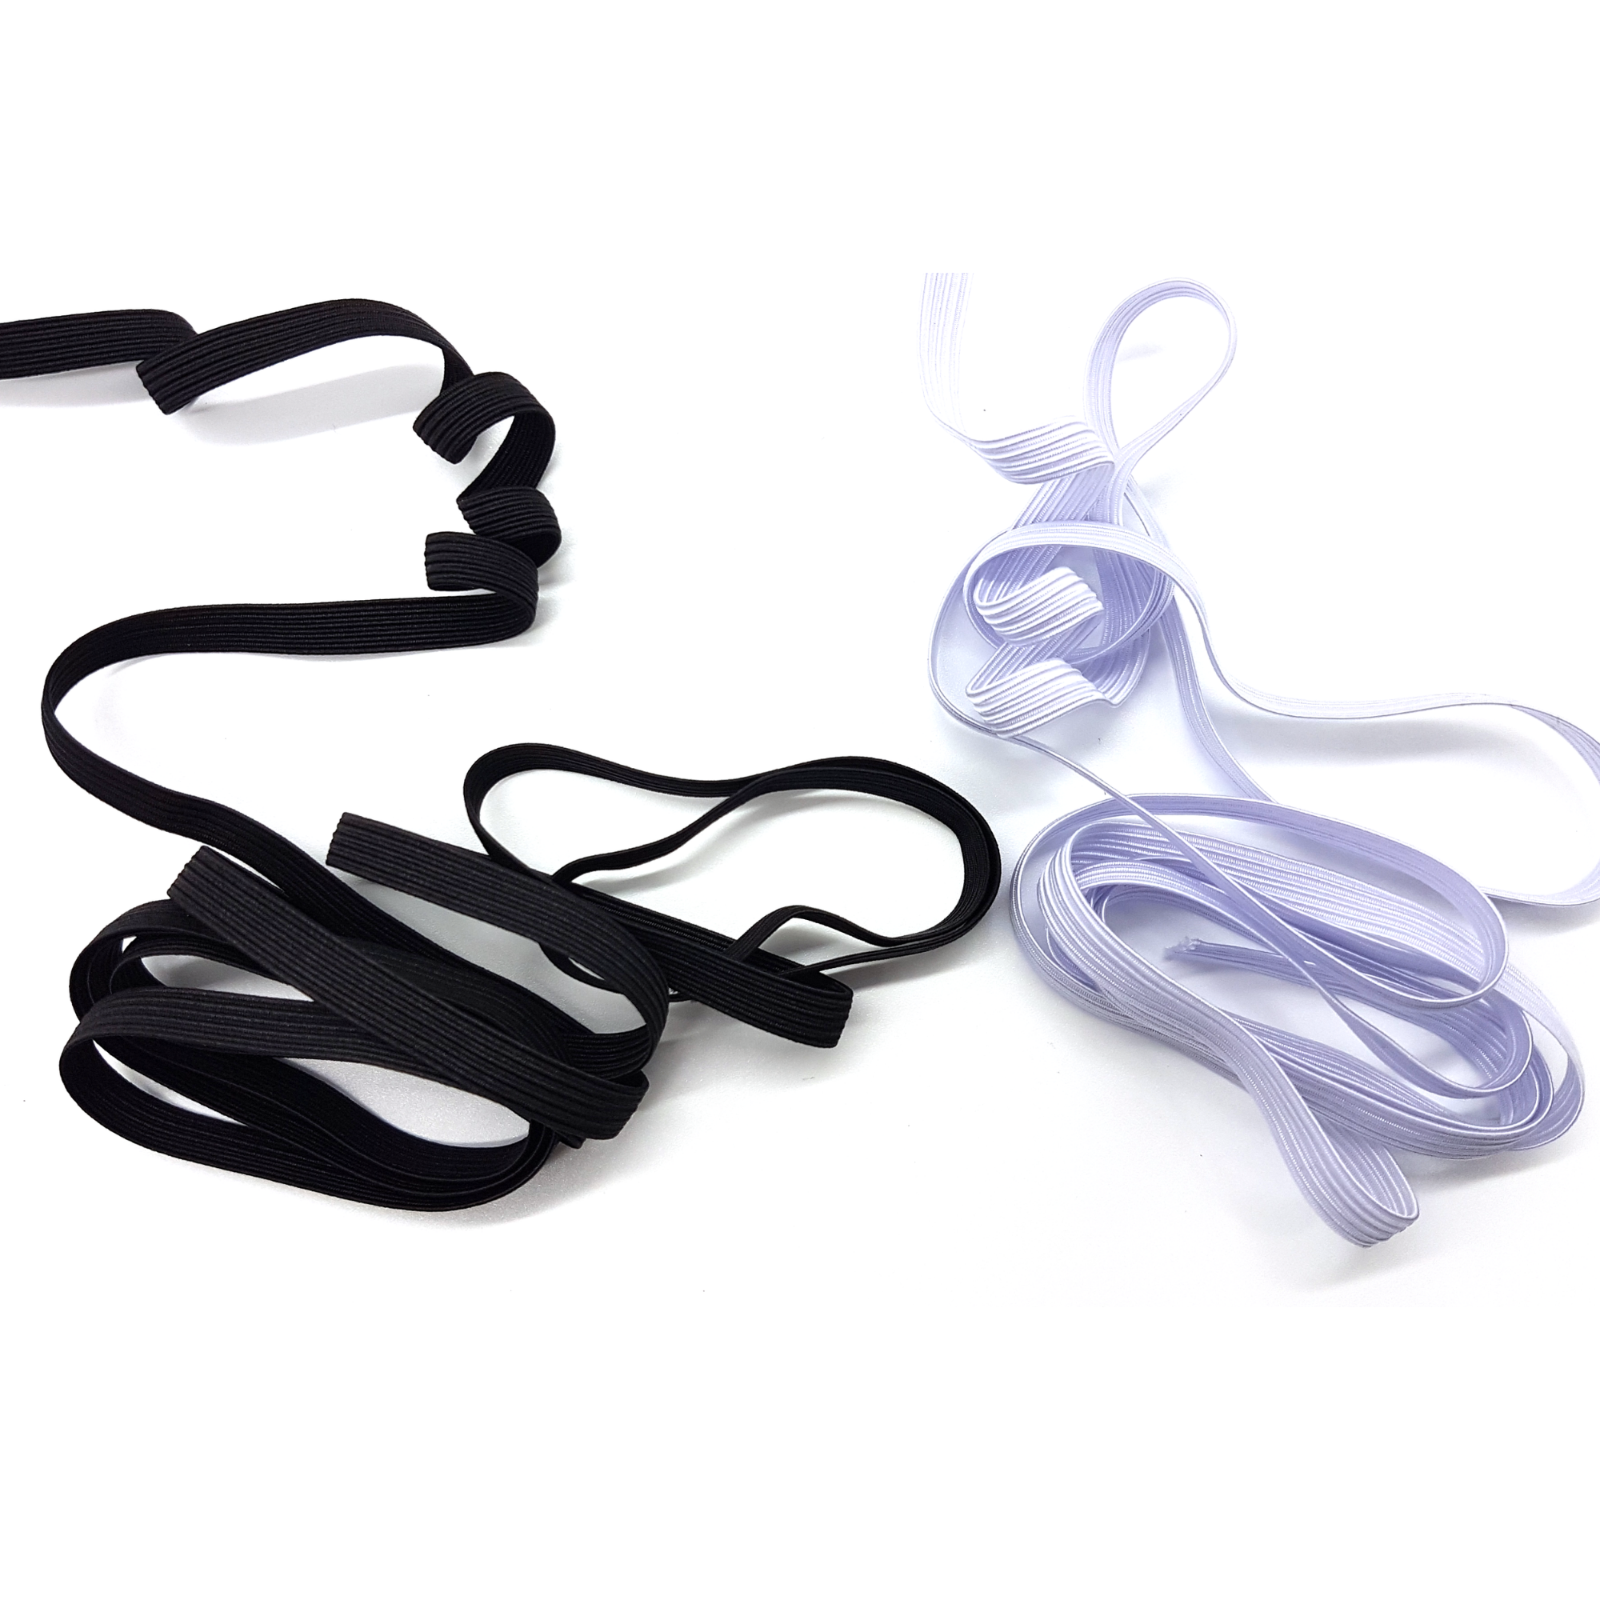 Flat Elastic Cord Sewing Black White 6mm 12mm 2